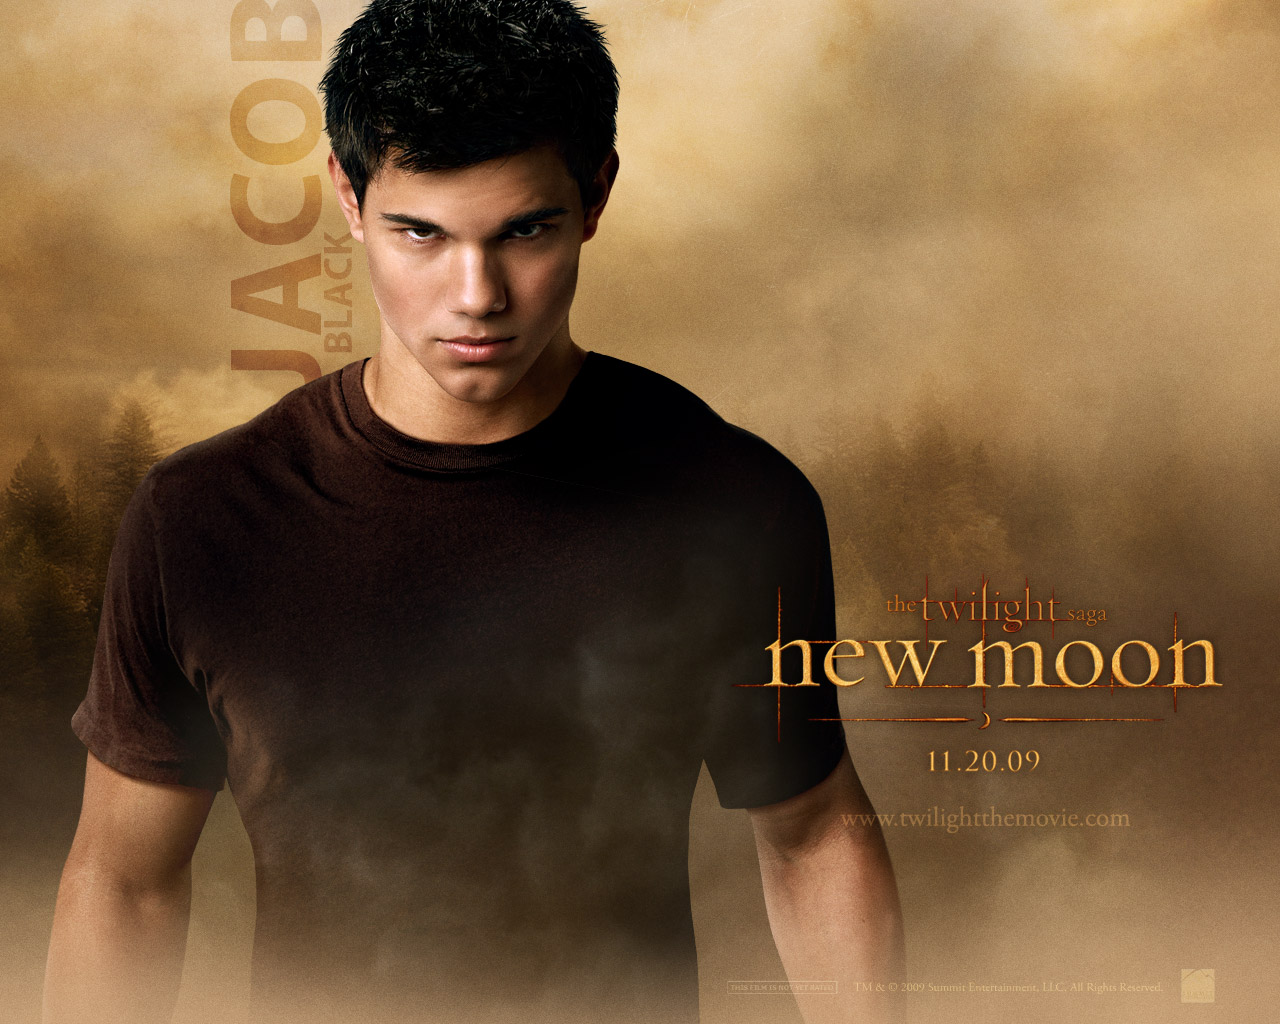 Twilight Saga New Moon Wallpapers - Jacob Black